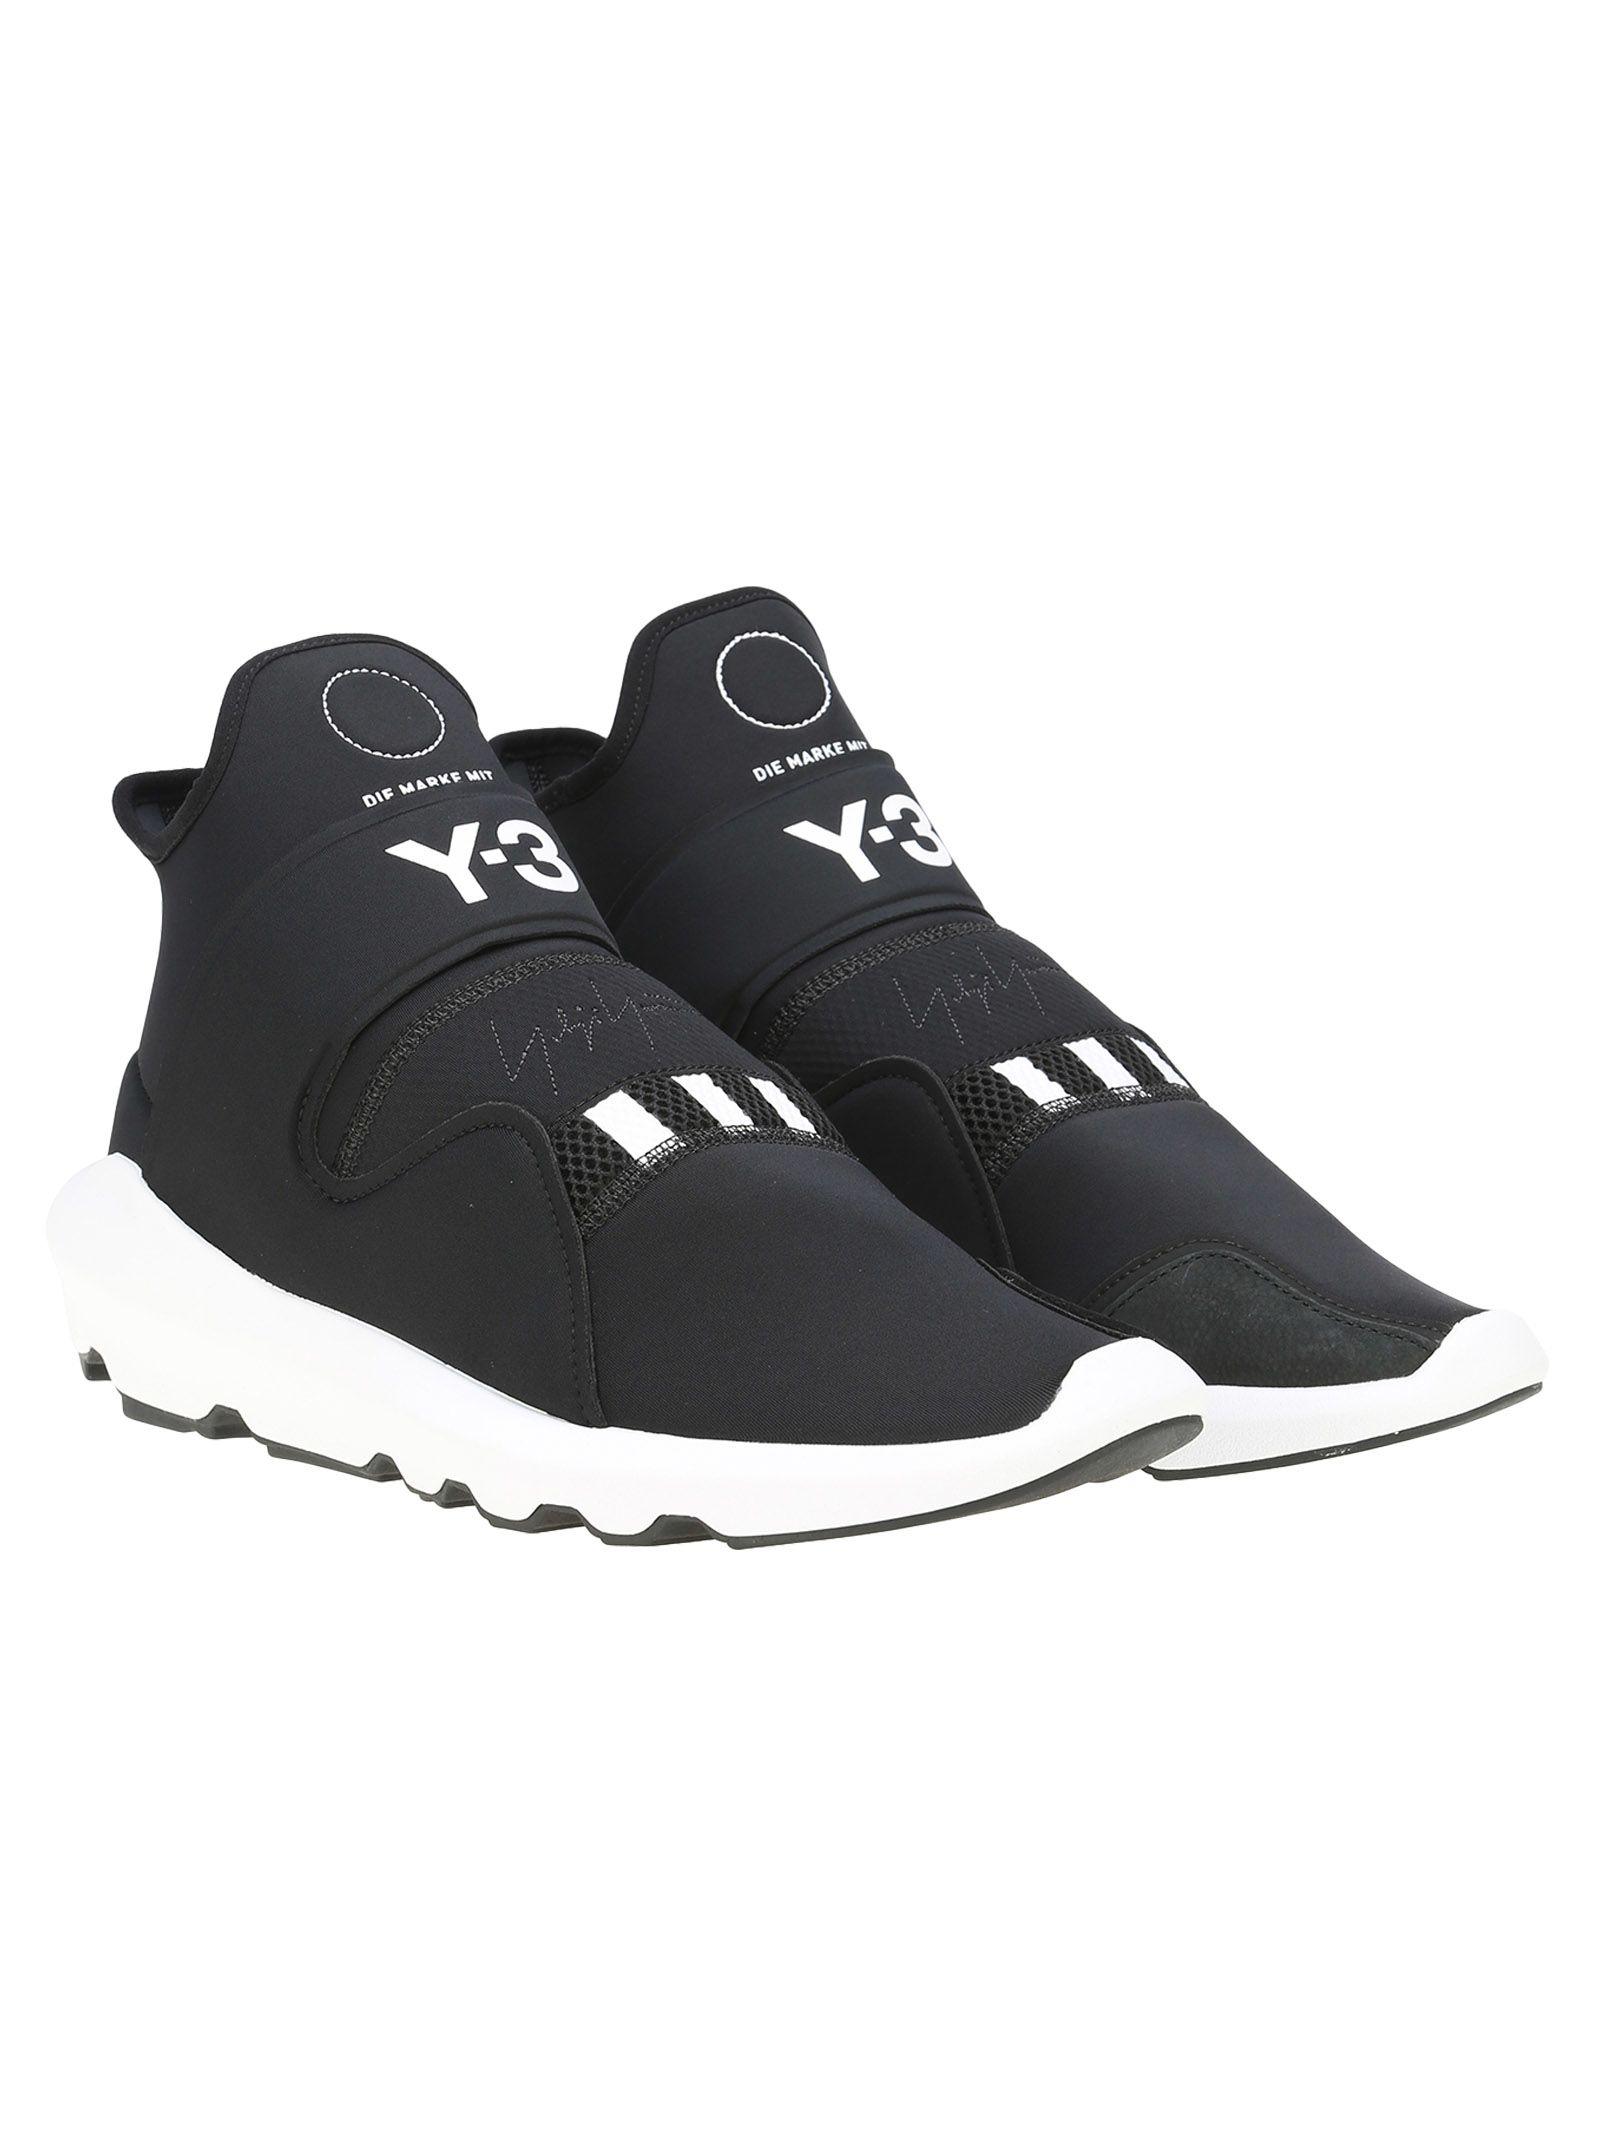 y 3 adidas y10 suberou black   white, uomini e 'sneakers italist